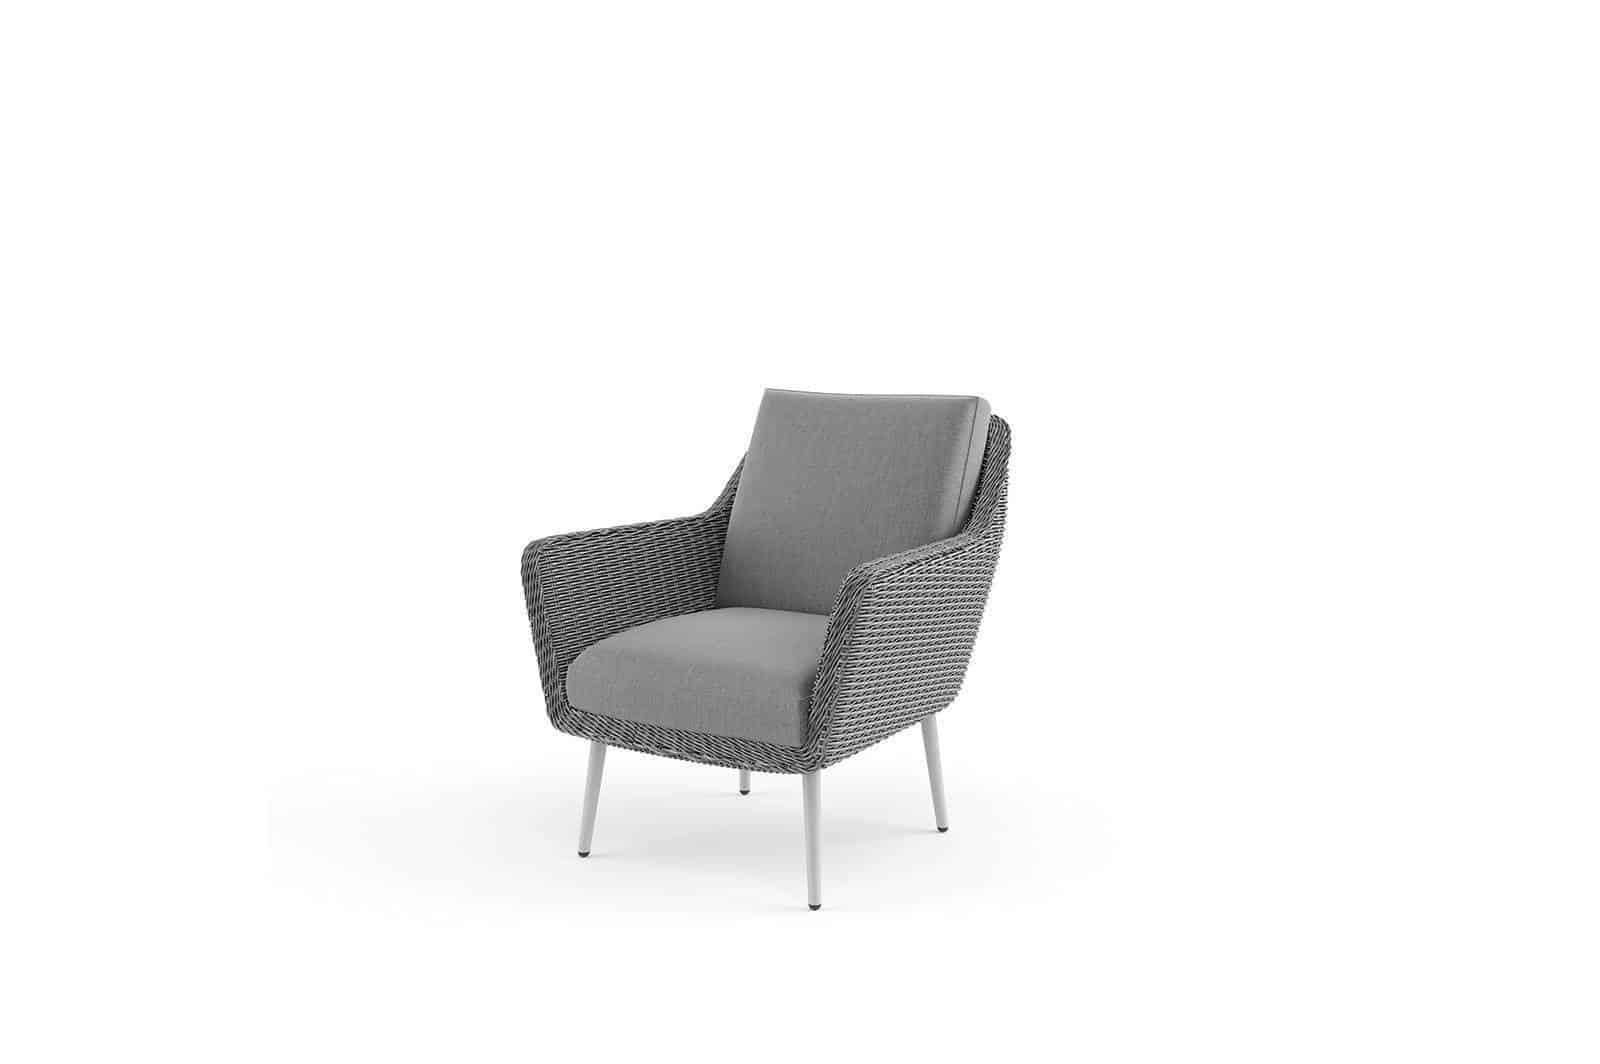 Fotel ogrodowy MONZA IMOLA